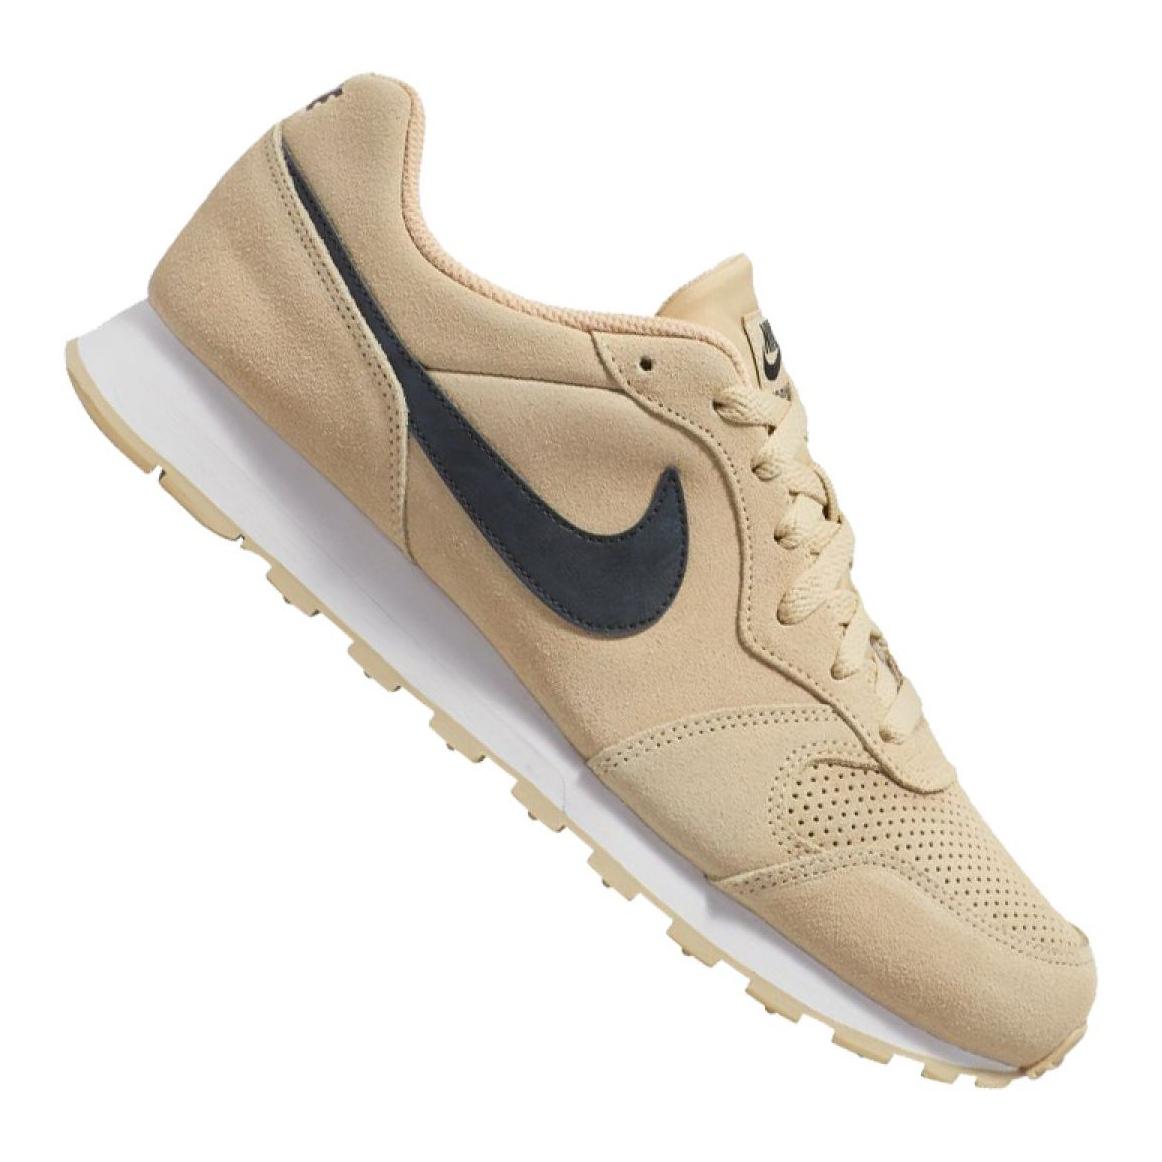 Nike Air Max Command Flex (PS) 844347 002 SchwarzAnthracite